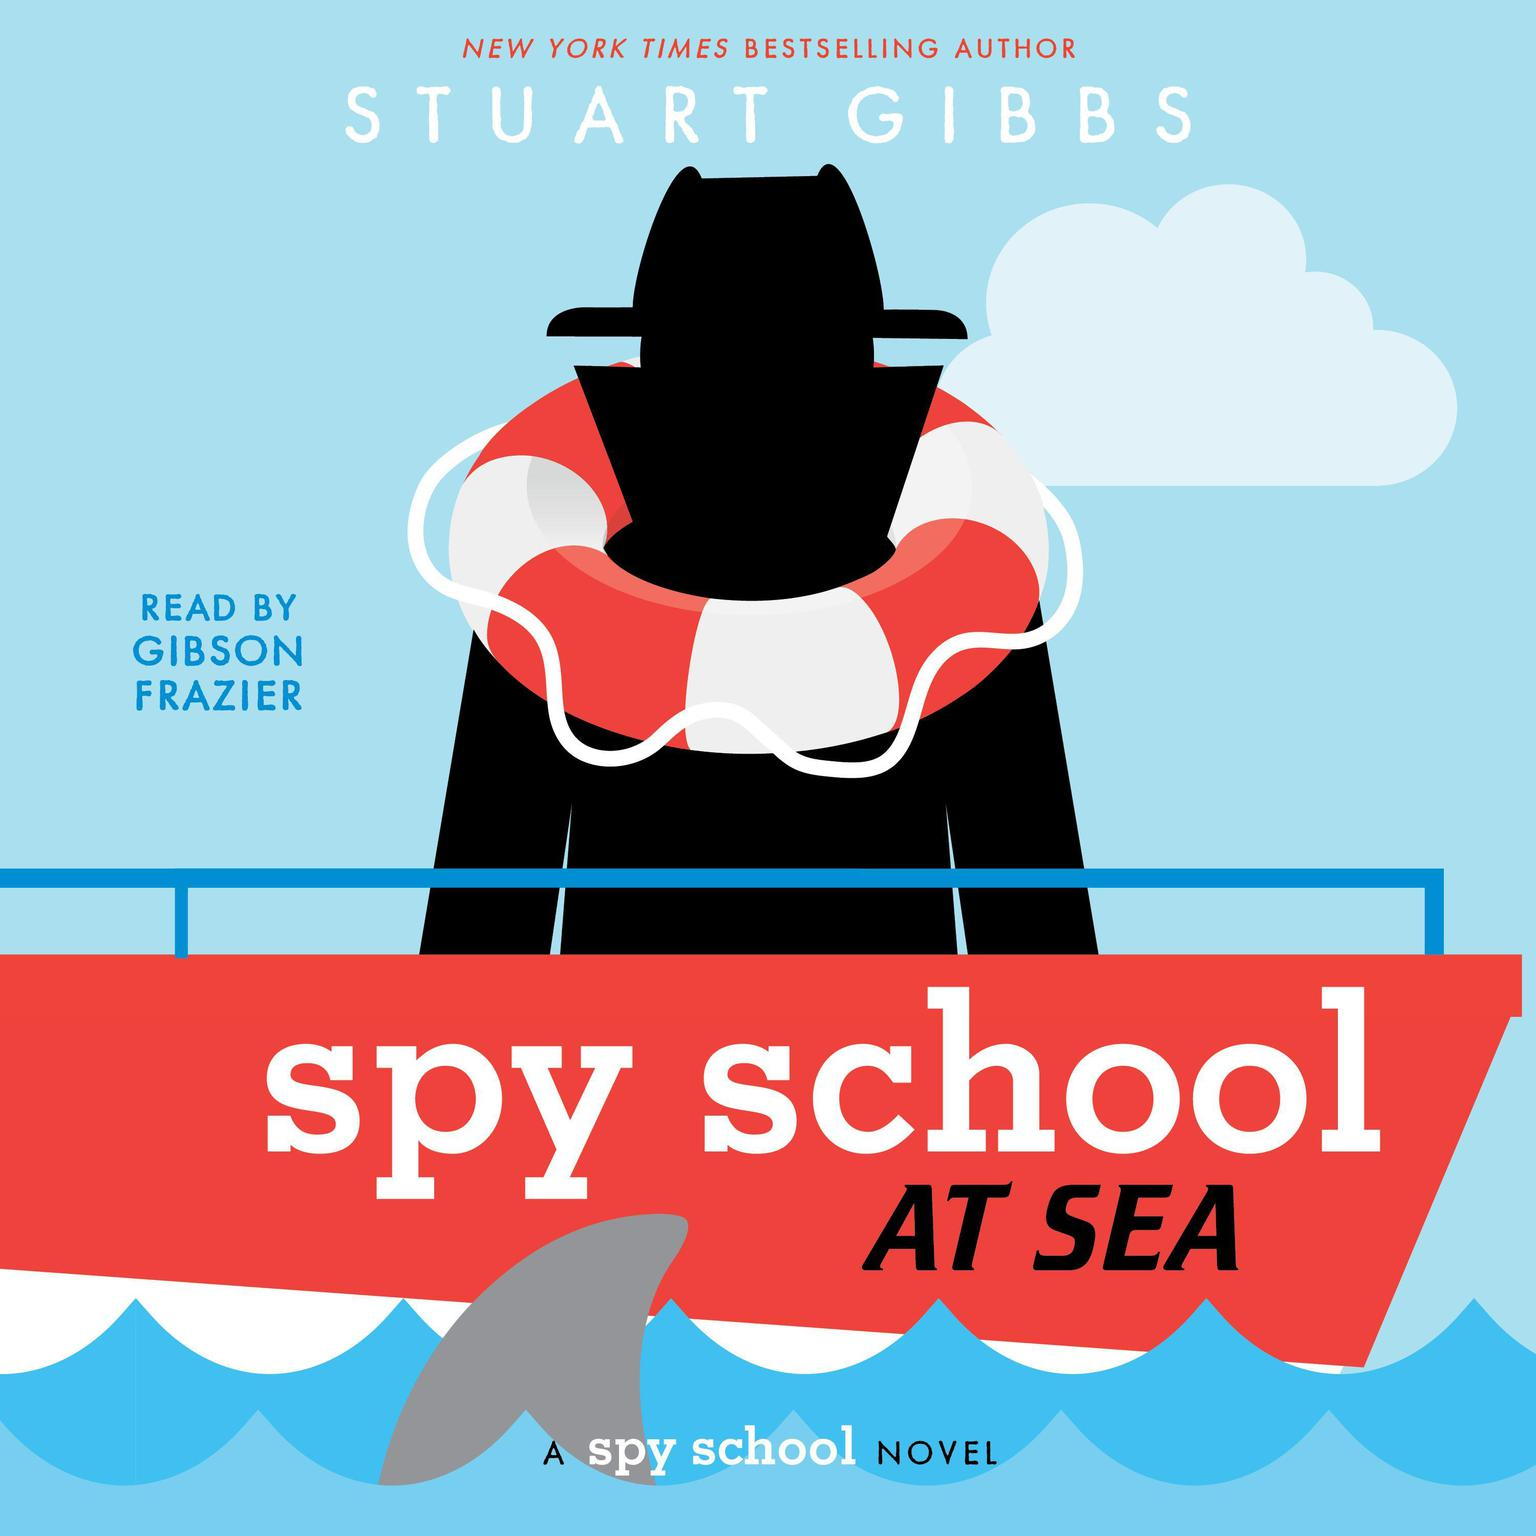 Spy School at Sea Audiobook, by Stuart Gibbs